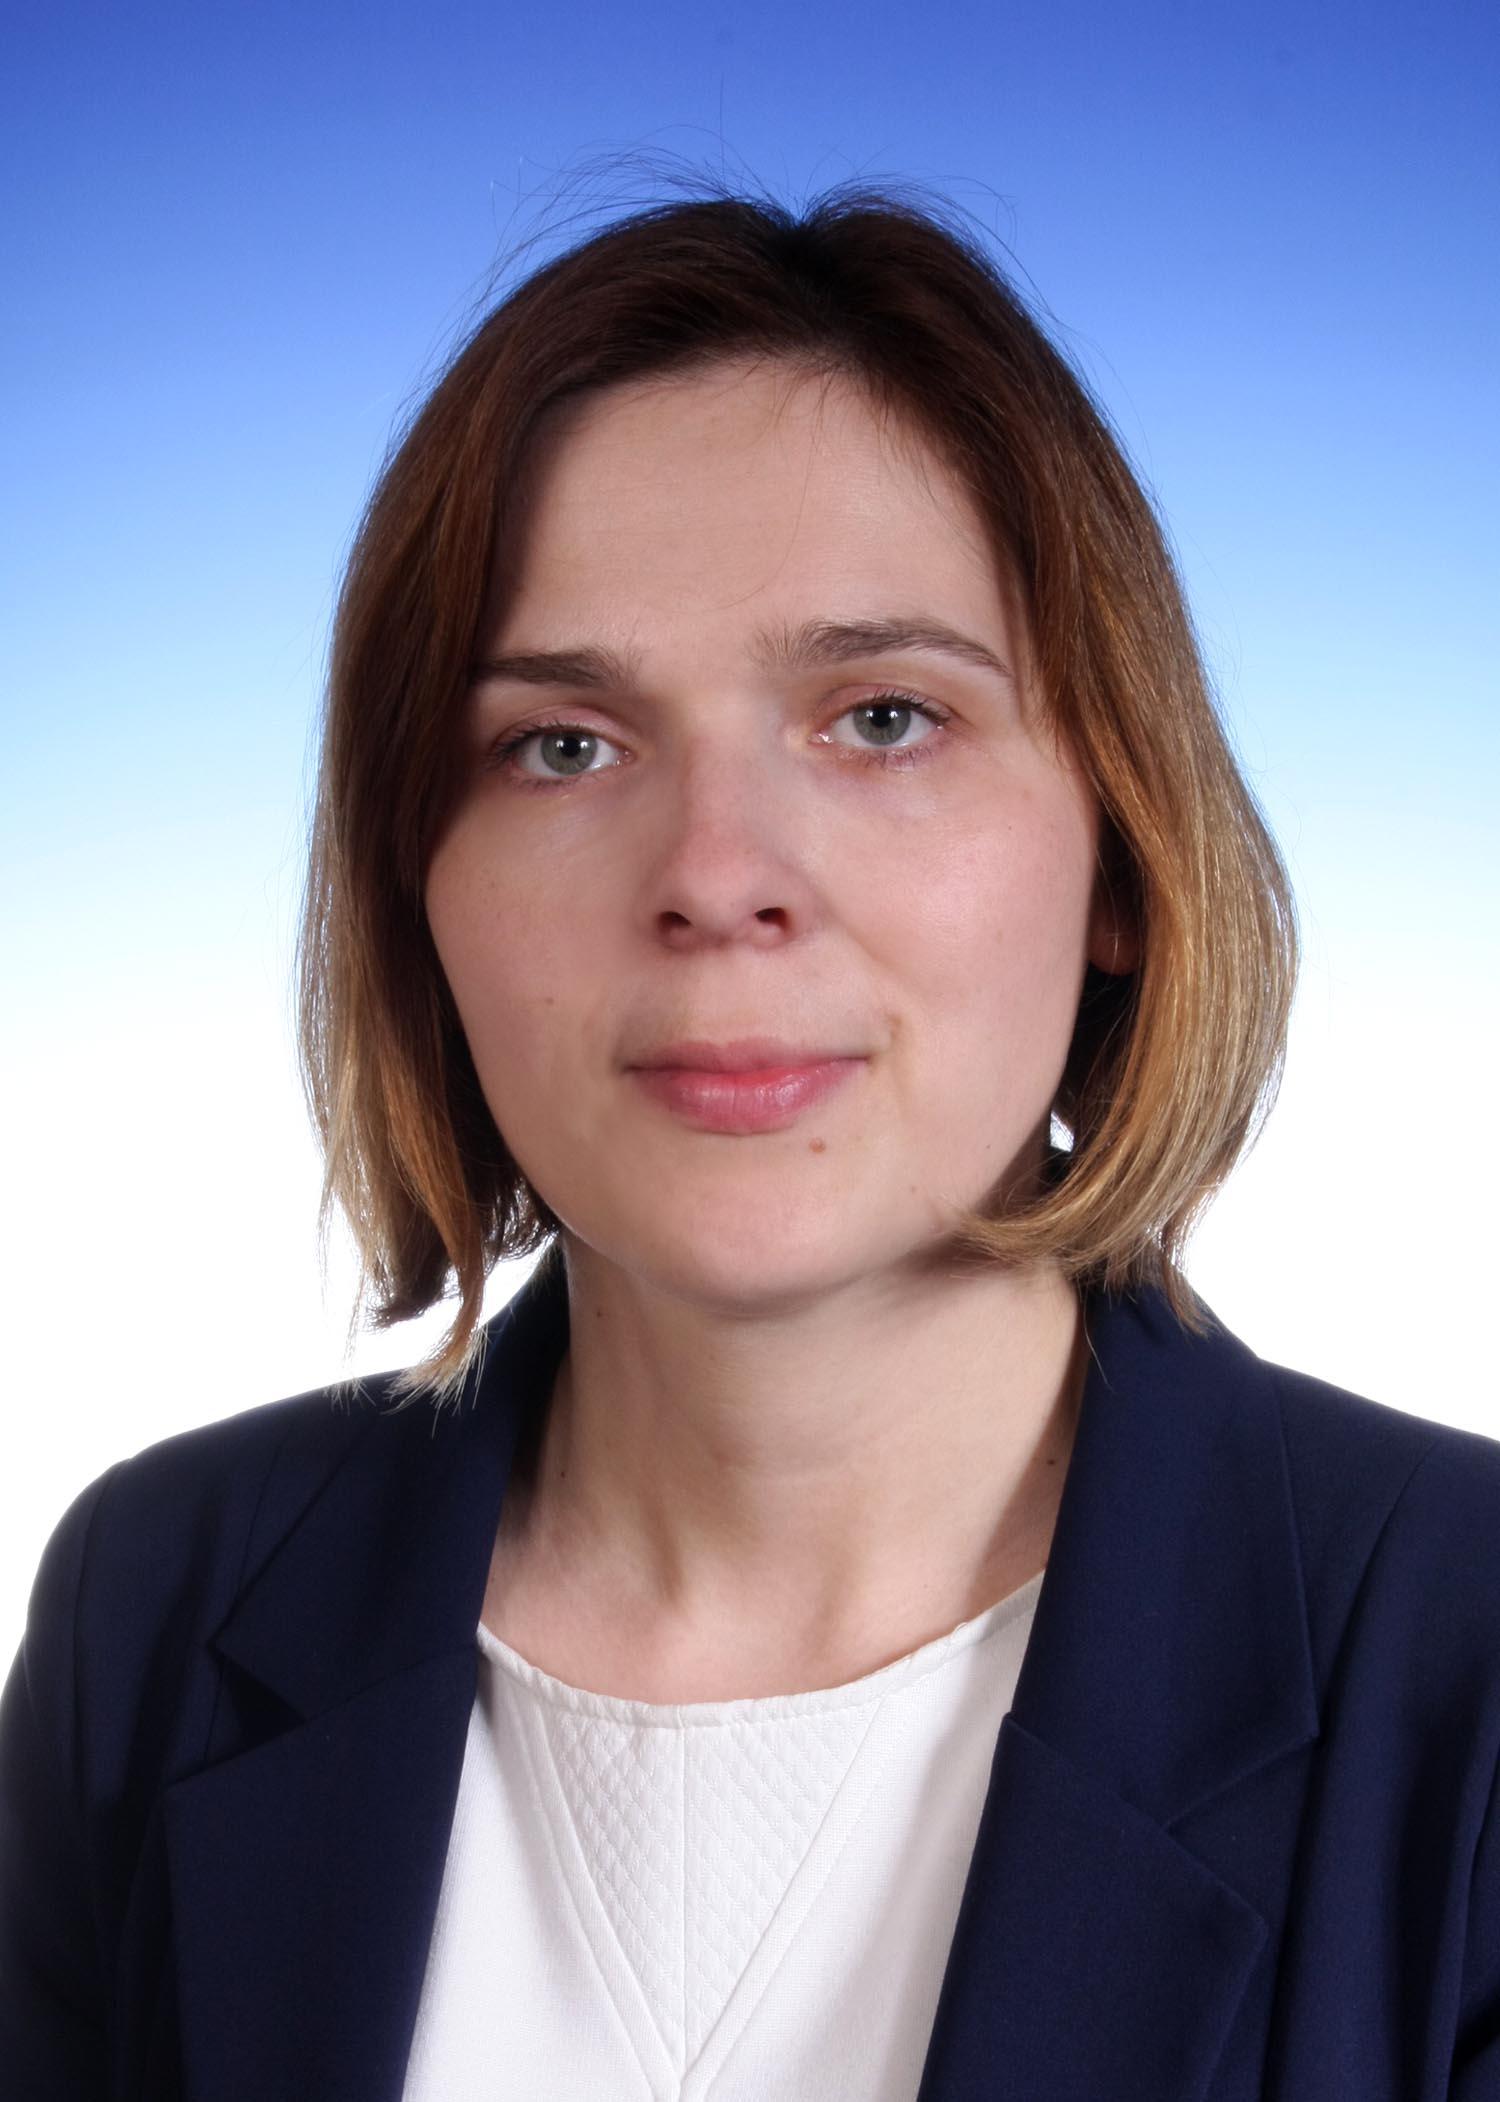 Aleksandra  Konieczna